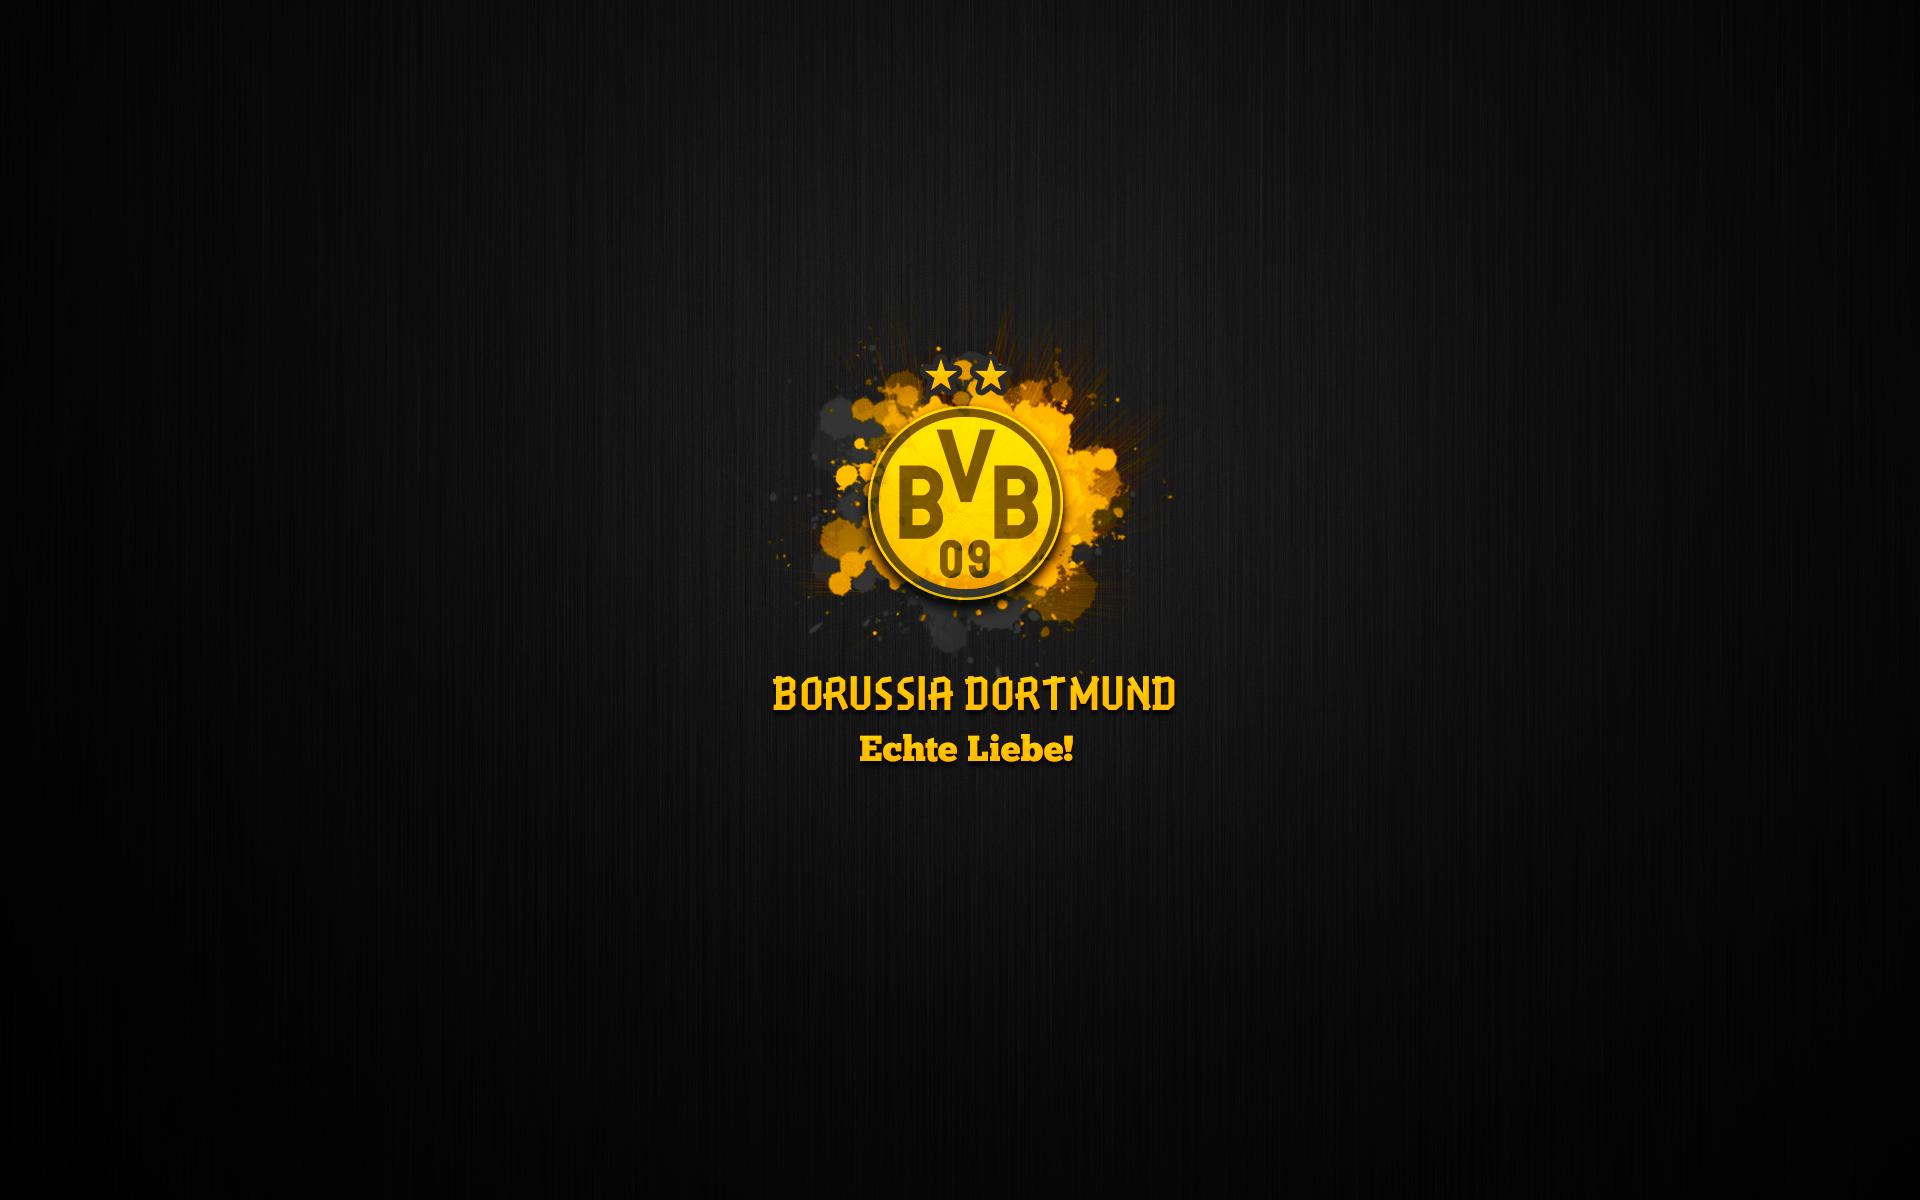 BVB 09 Borussia Dortmund Wallpaper Background by pname 1920x1200